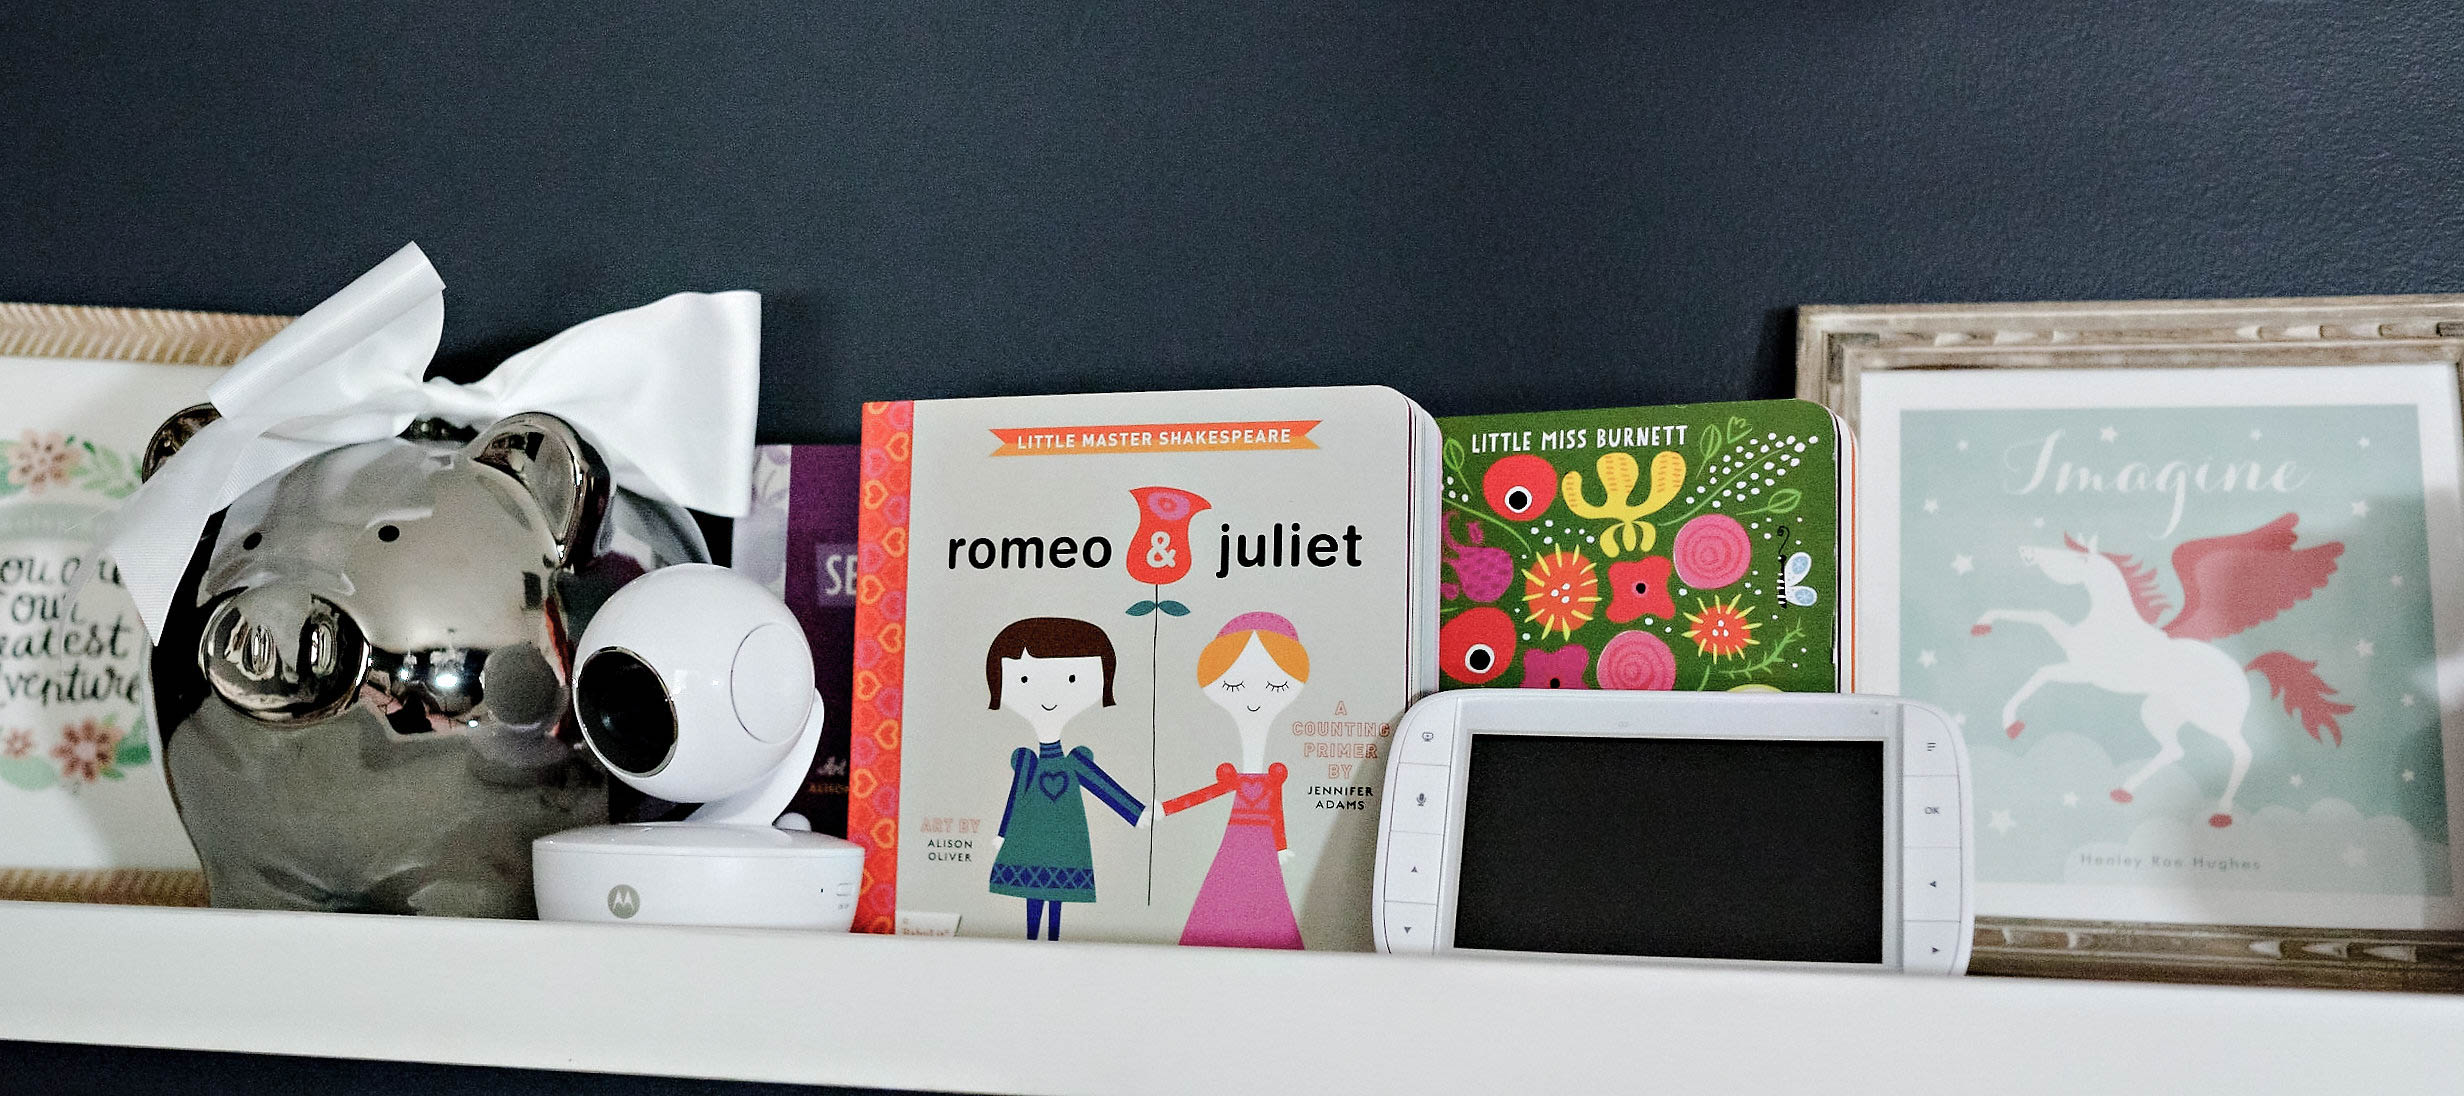 motorola monitor for babies - Girls Toddler Room Makeover by Atlanta mom blogger Happily Hughes